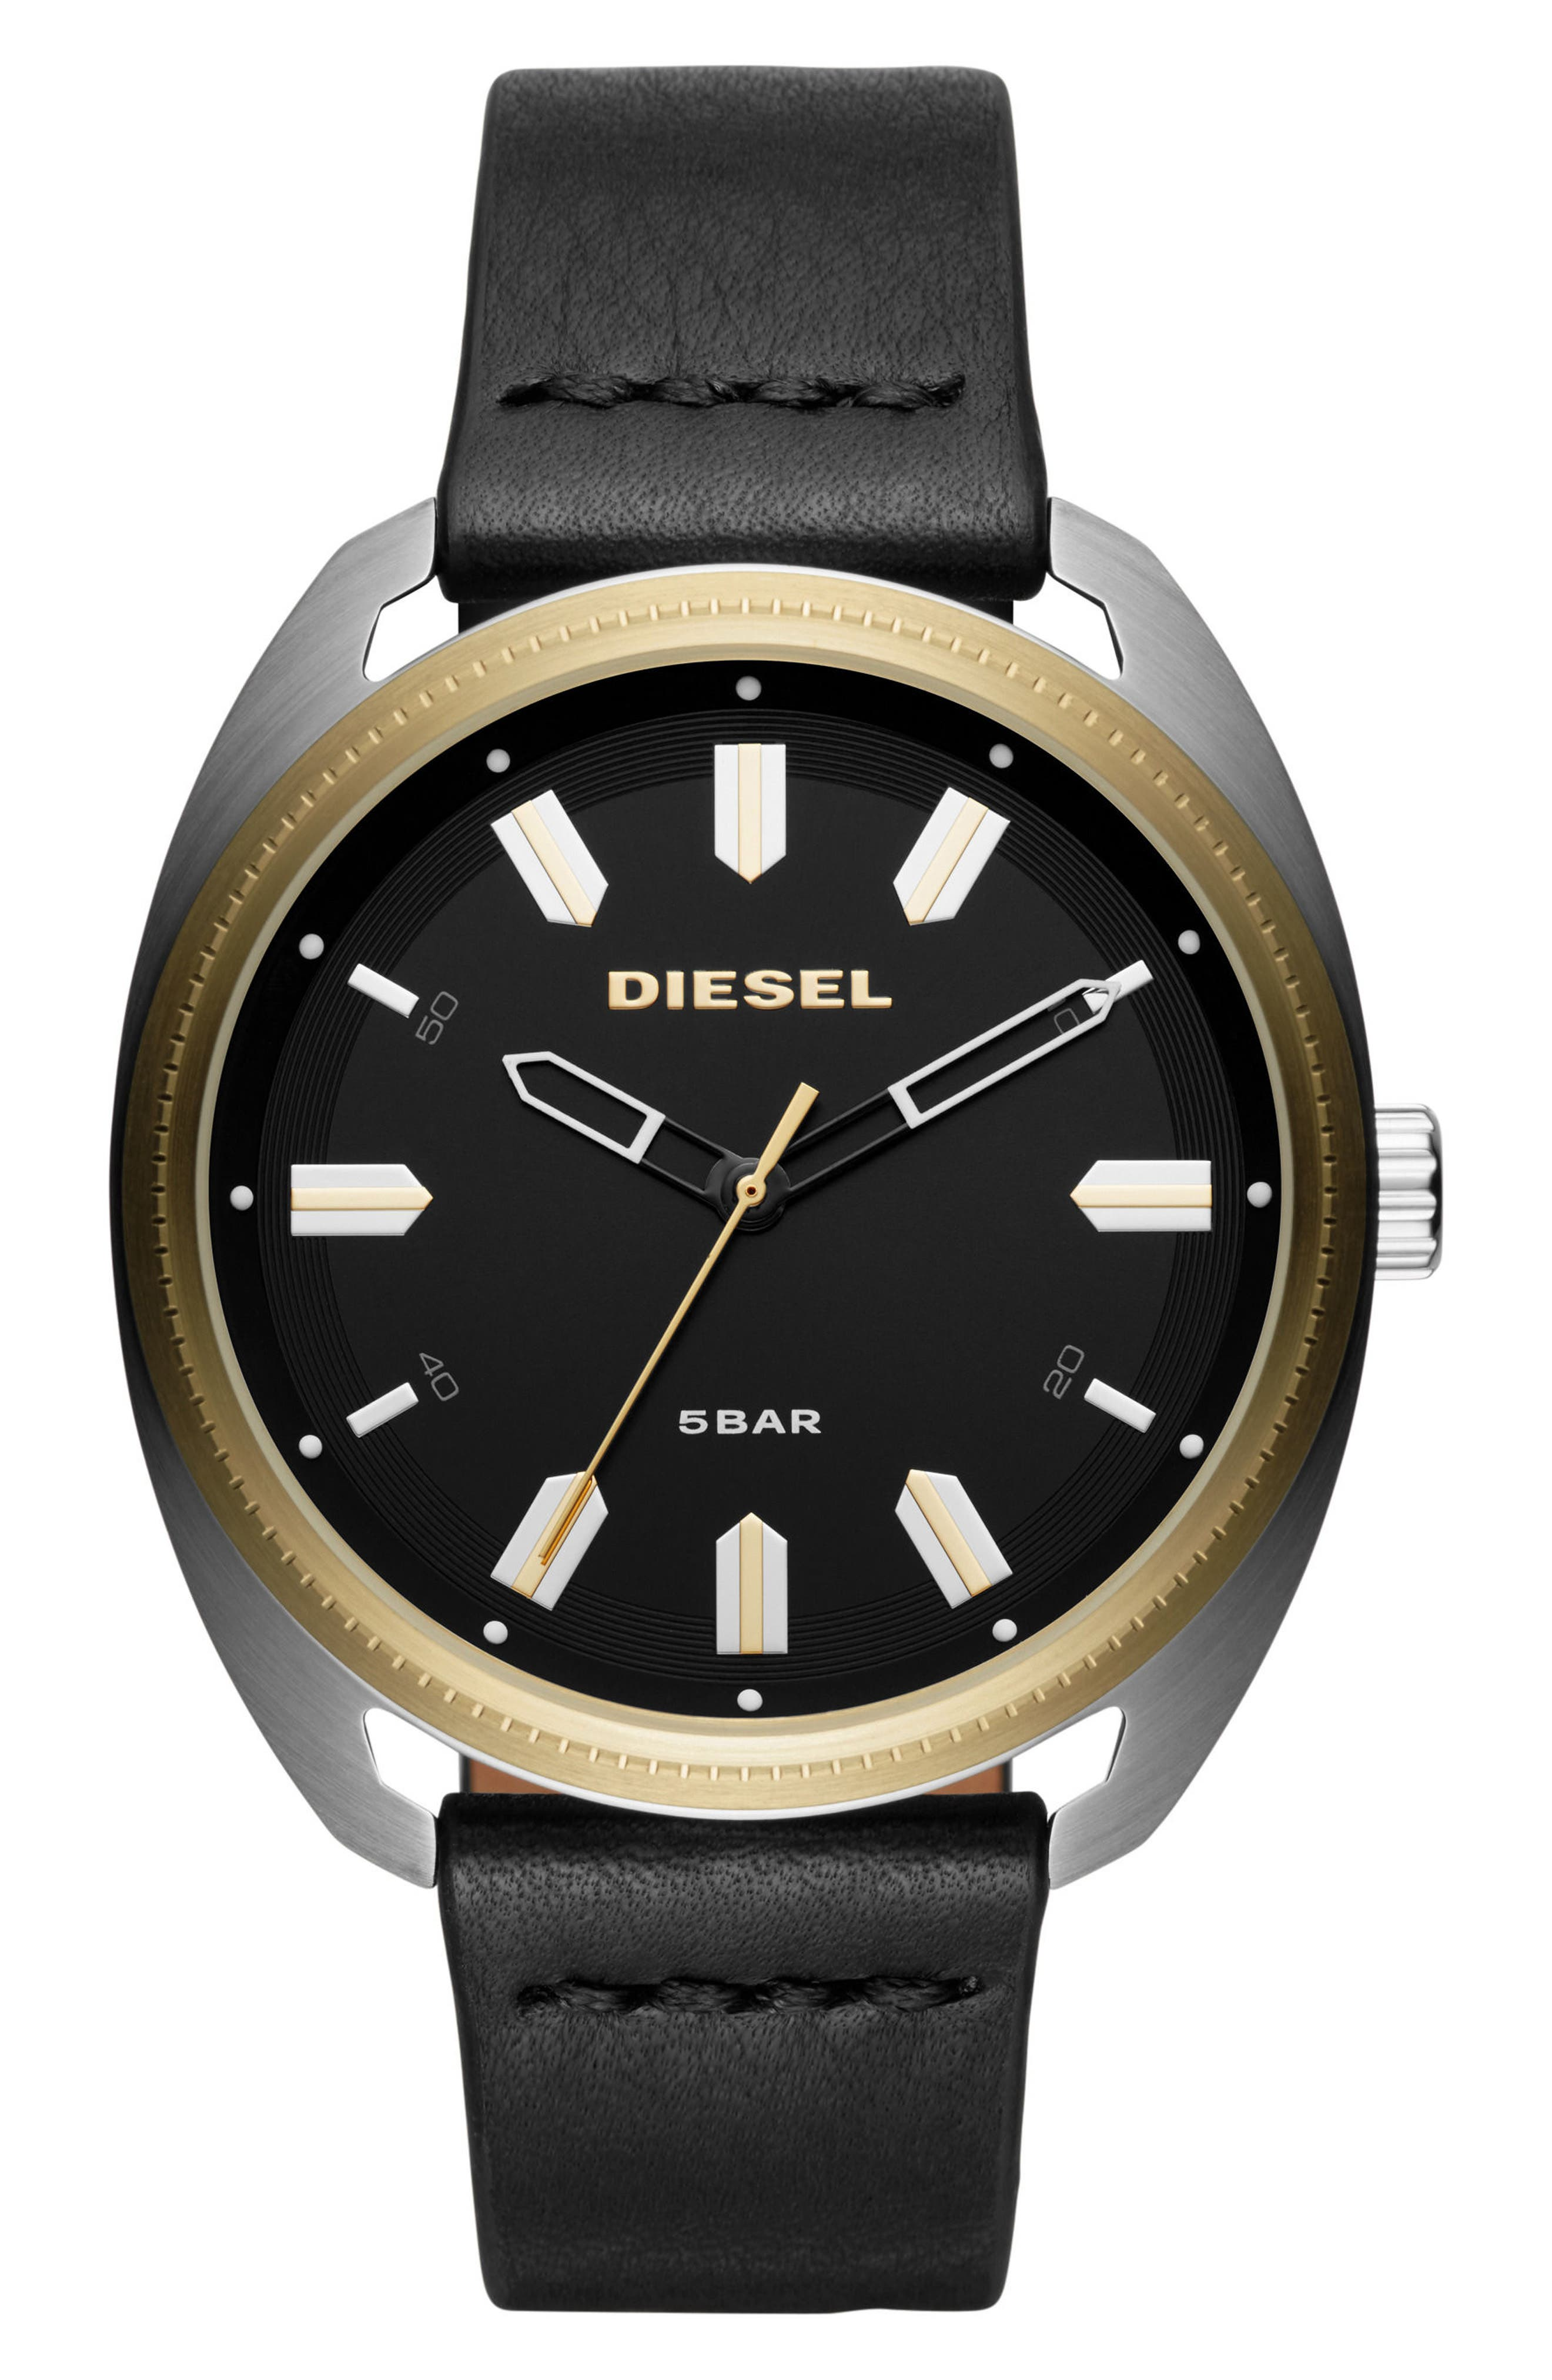 DIESEL<SUP>®</SUP> Fastbak Leather Strap Watch, 45mm x 51mm